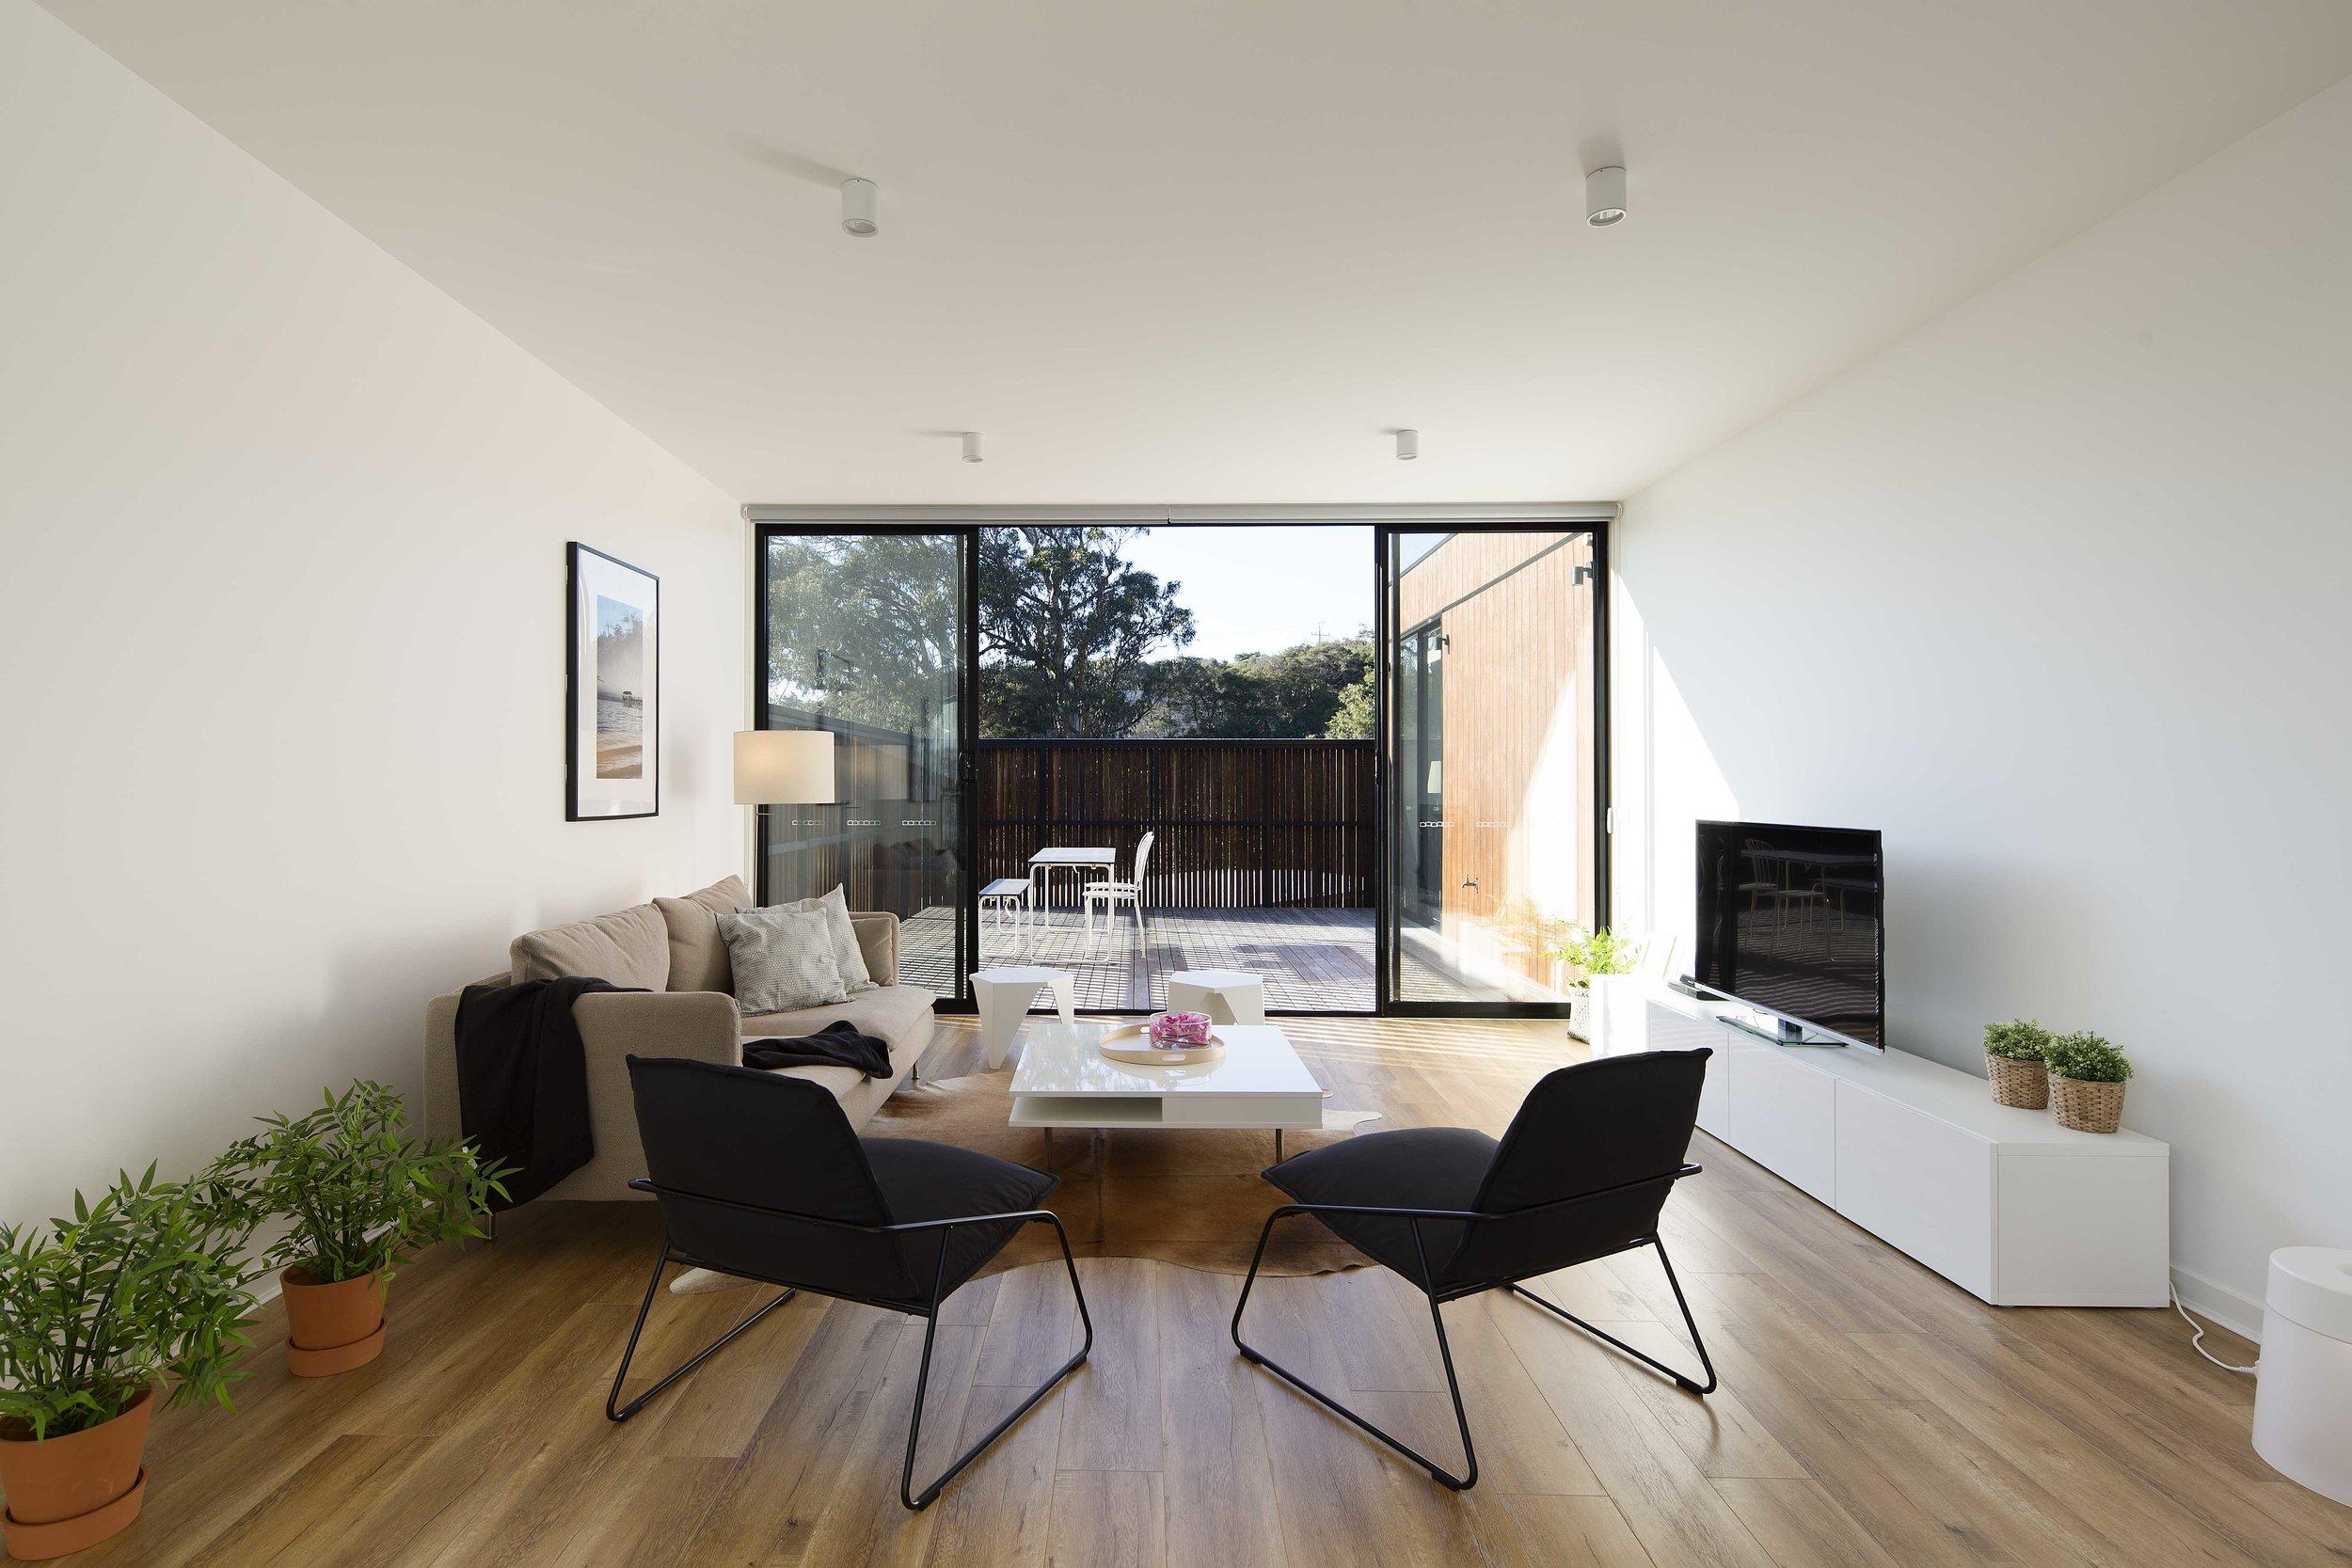 Pitch_Architecture_Black Box House_6